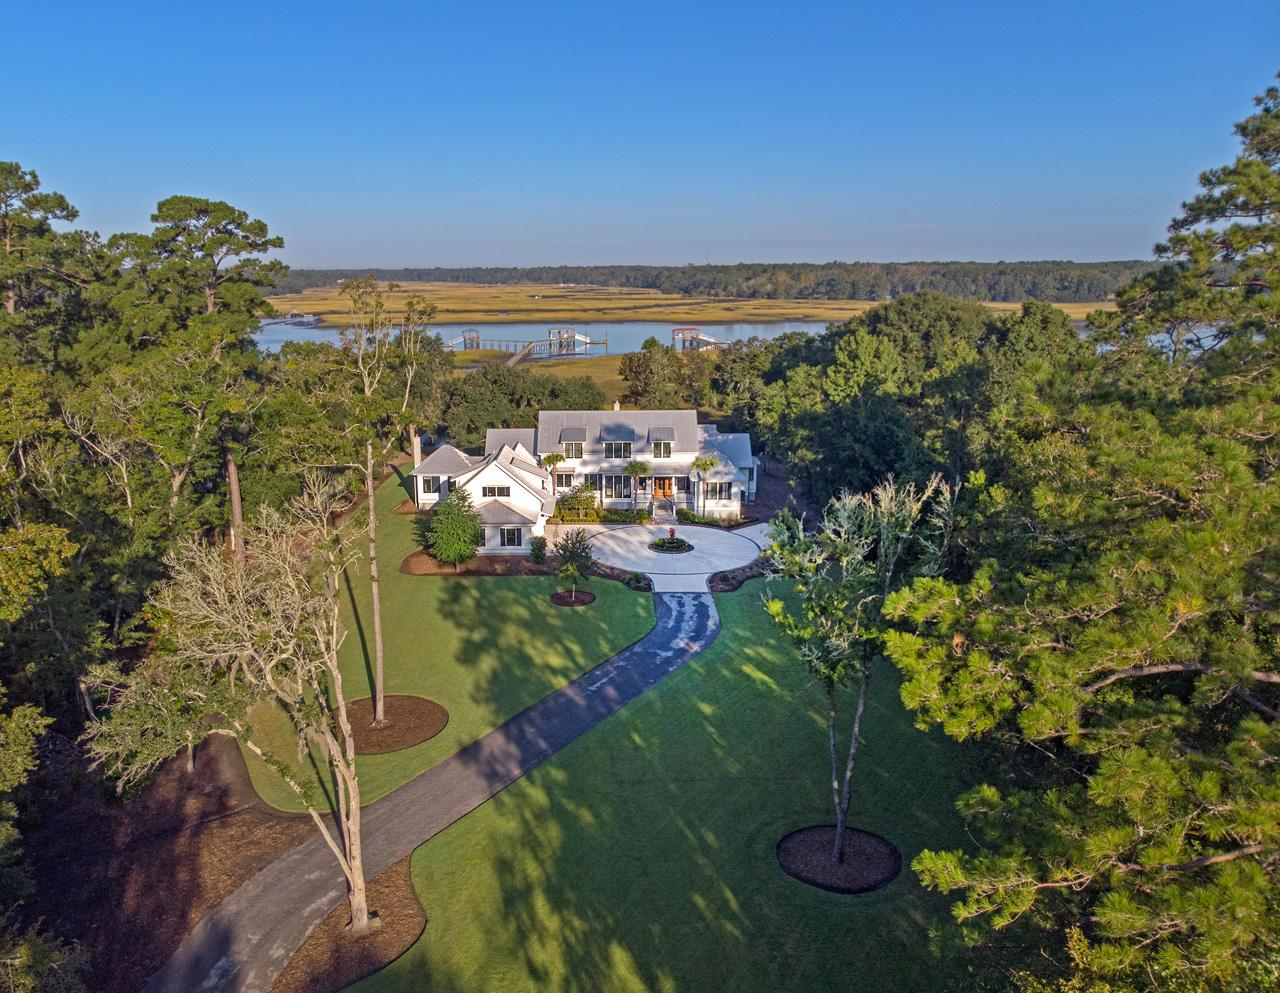 Johns Island Homes For Sale - 3977 Seaboard, Johns Island, SC - 44